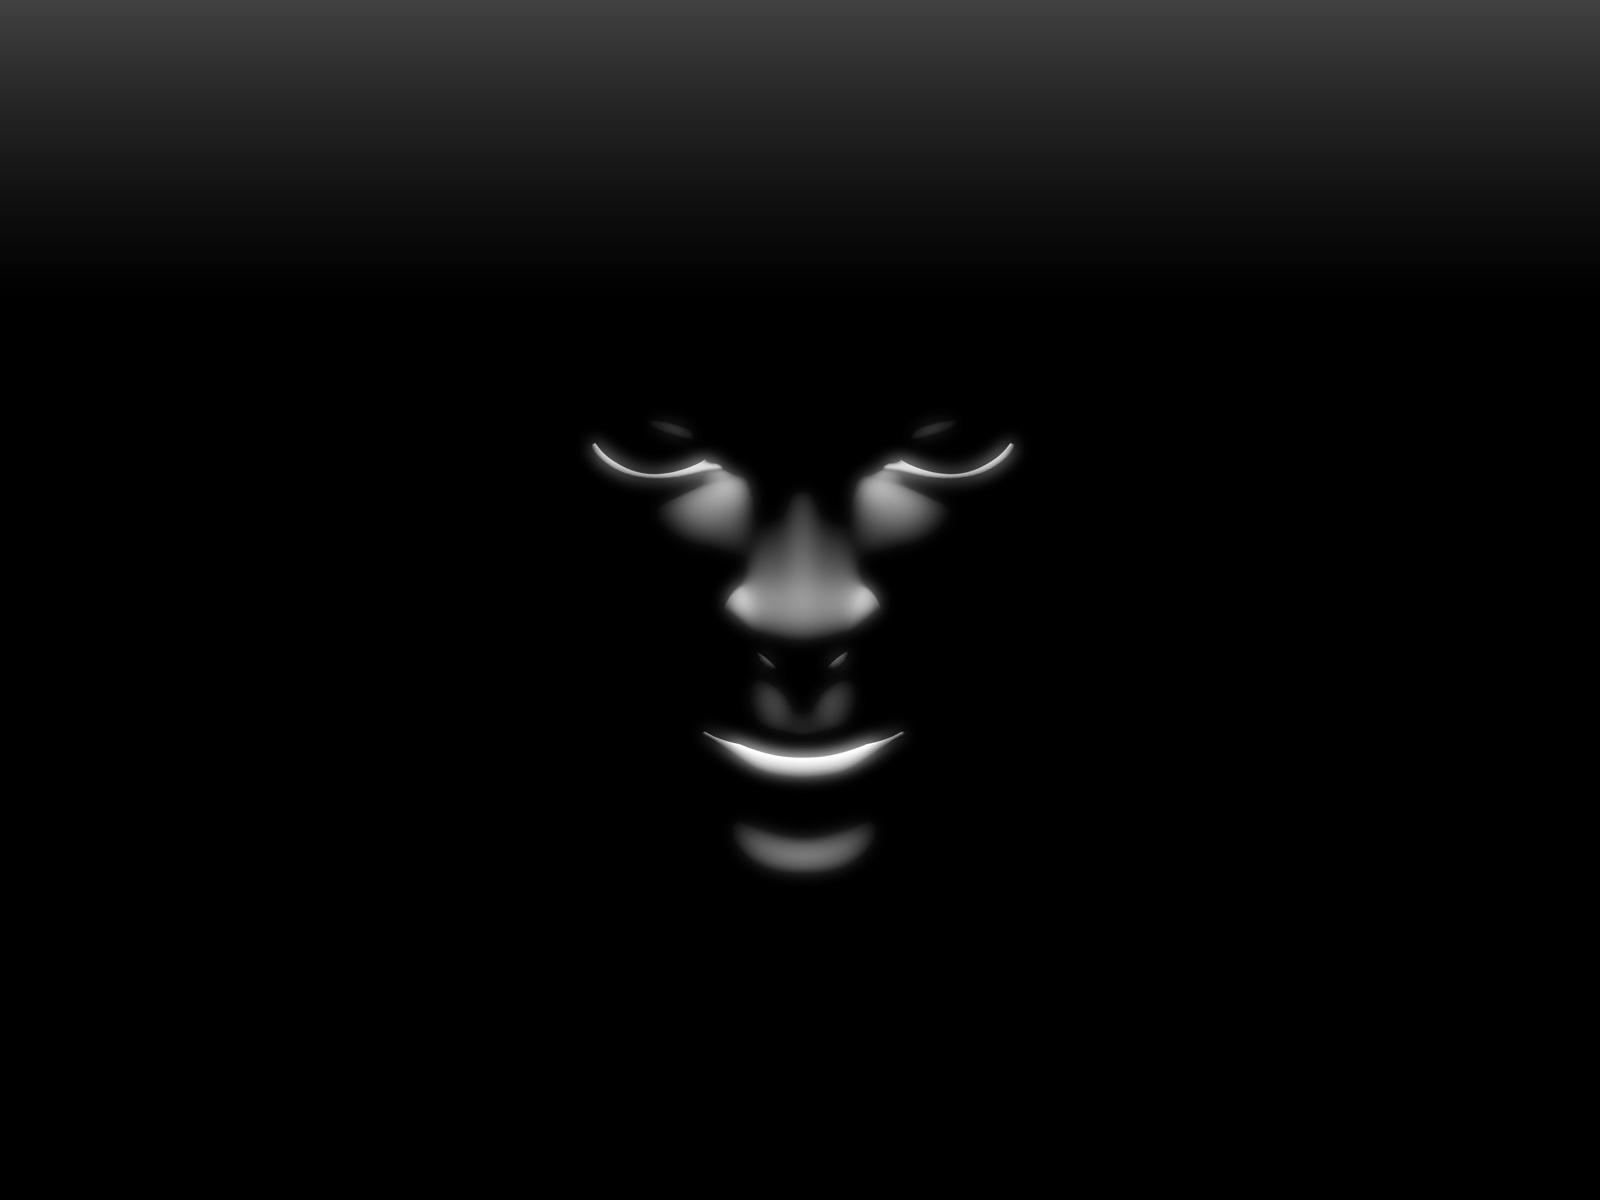 Black 3D Desktop HD Wallpapers   Siyah 3D HD Masa252st252 1600x1200